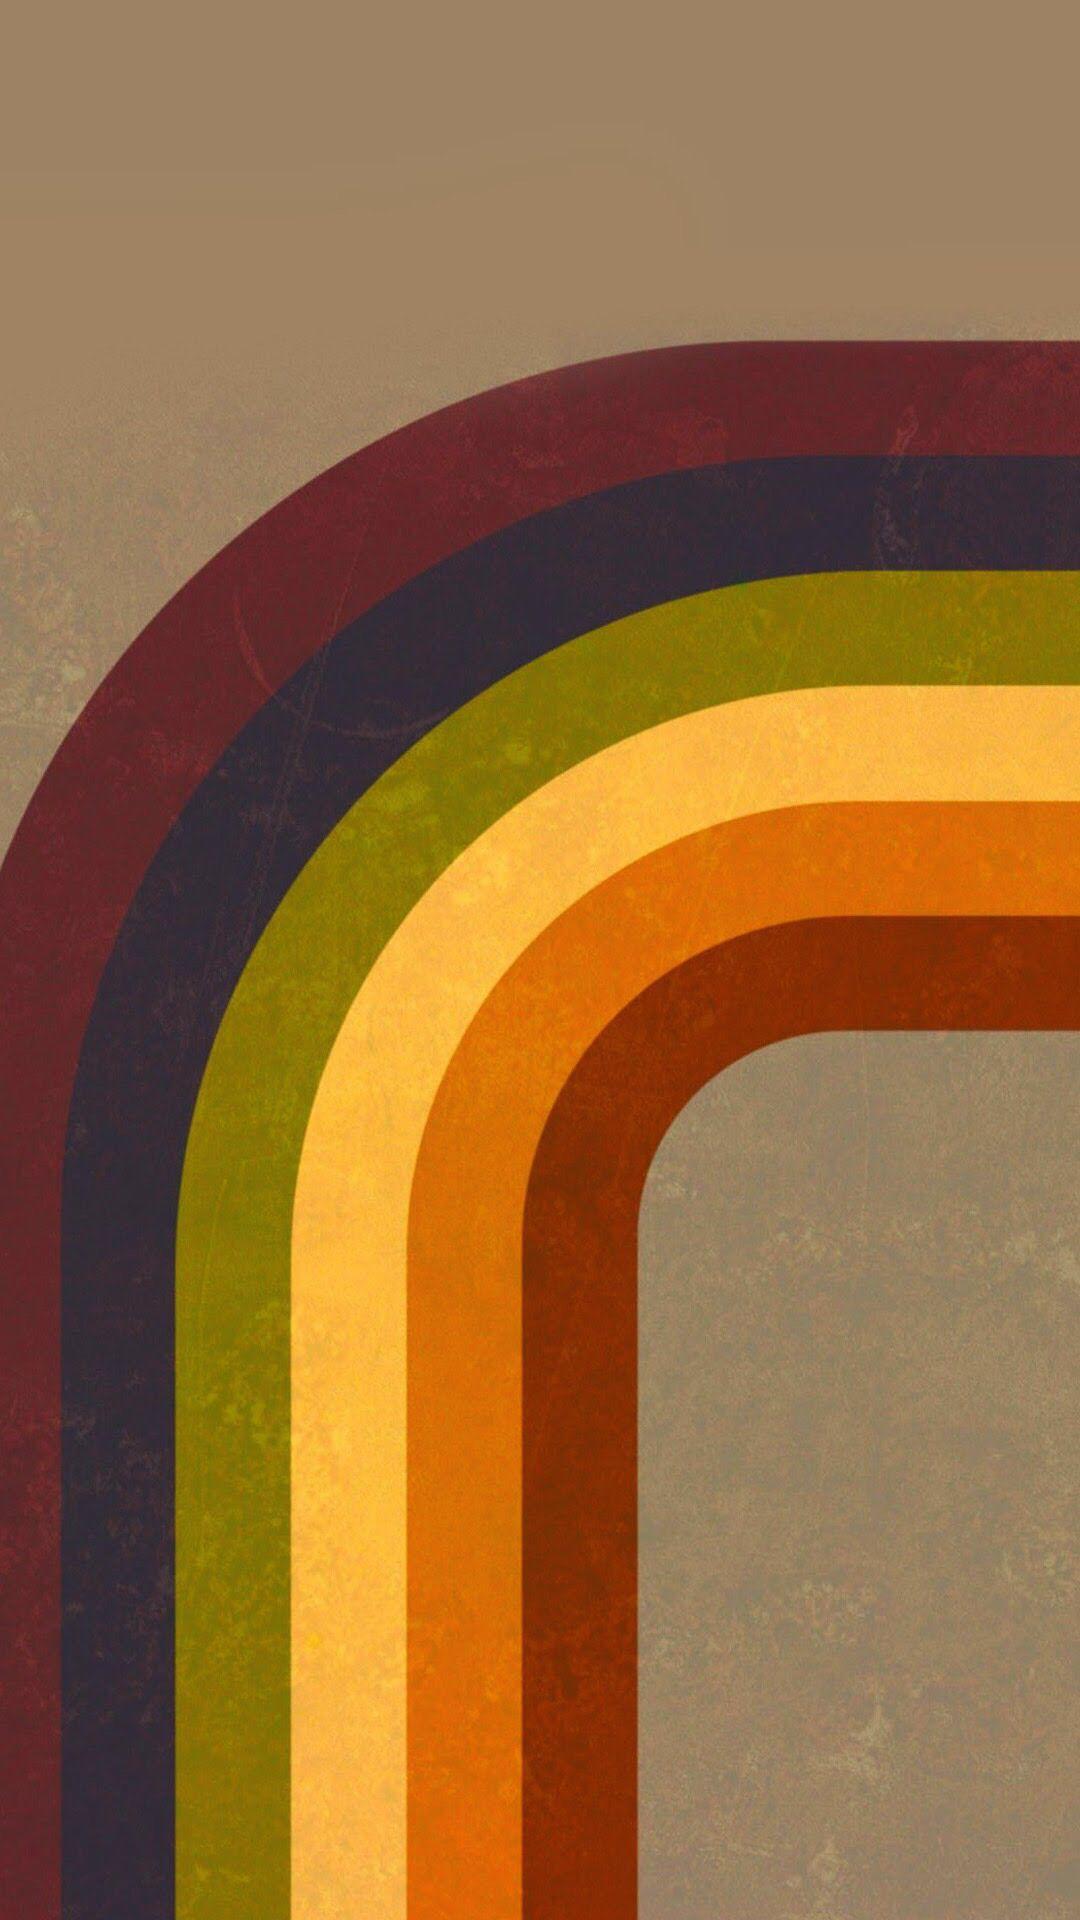 Rainbow Pattern Retro Wallpaper Retro Background Retro